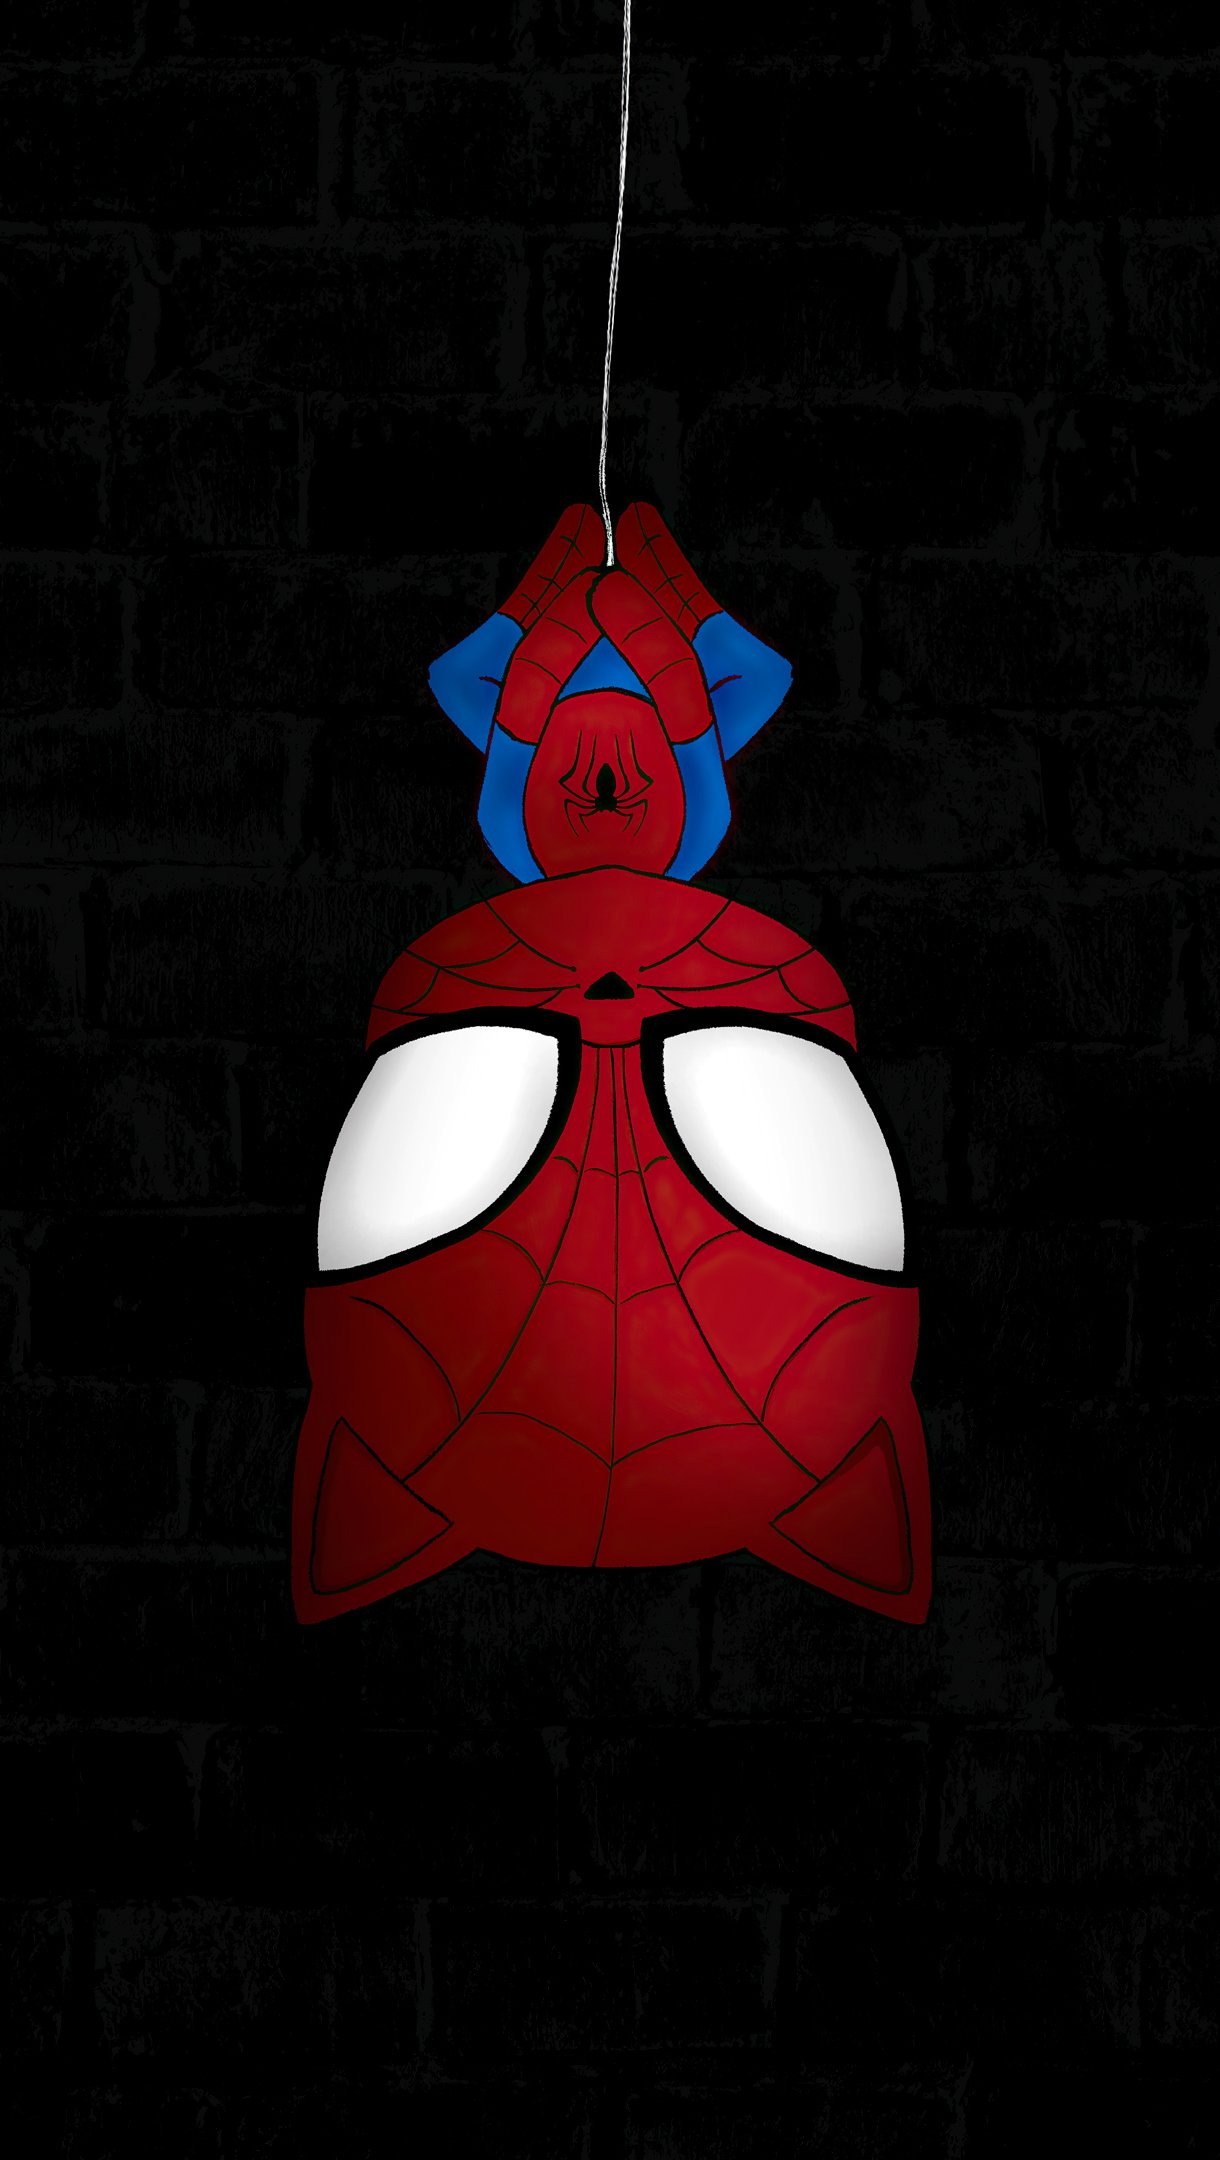 Wallpaper Spider Man Hanging Vertical